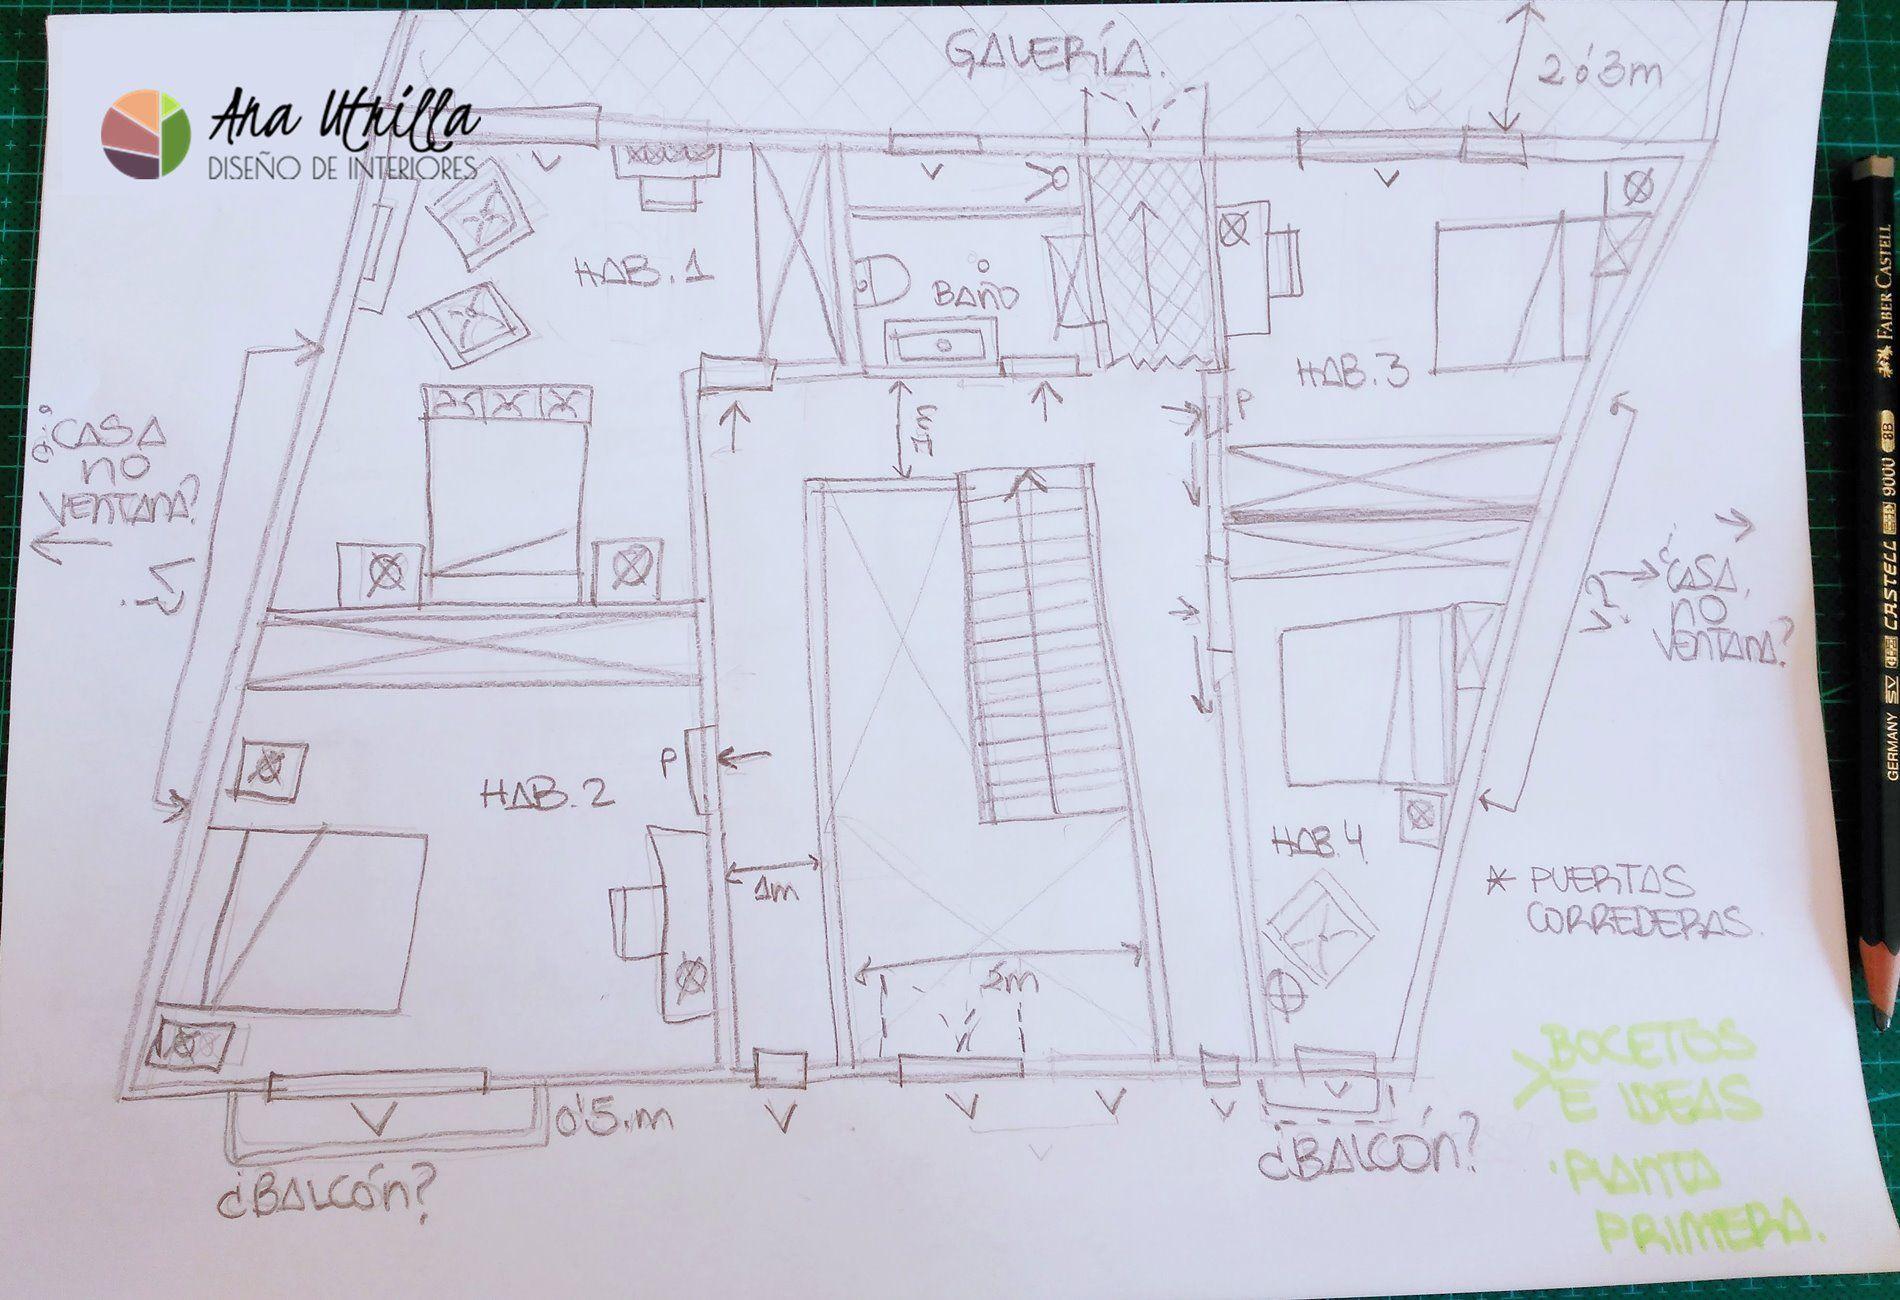 Plano de segunda planta a mano alzada de casa rural en León